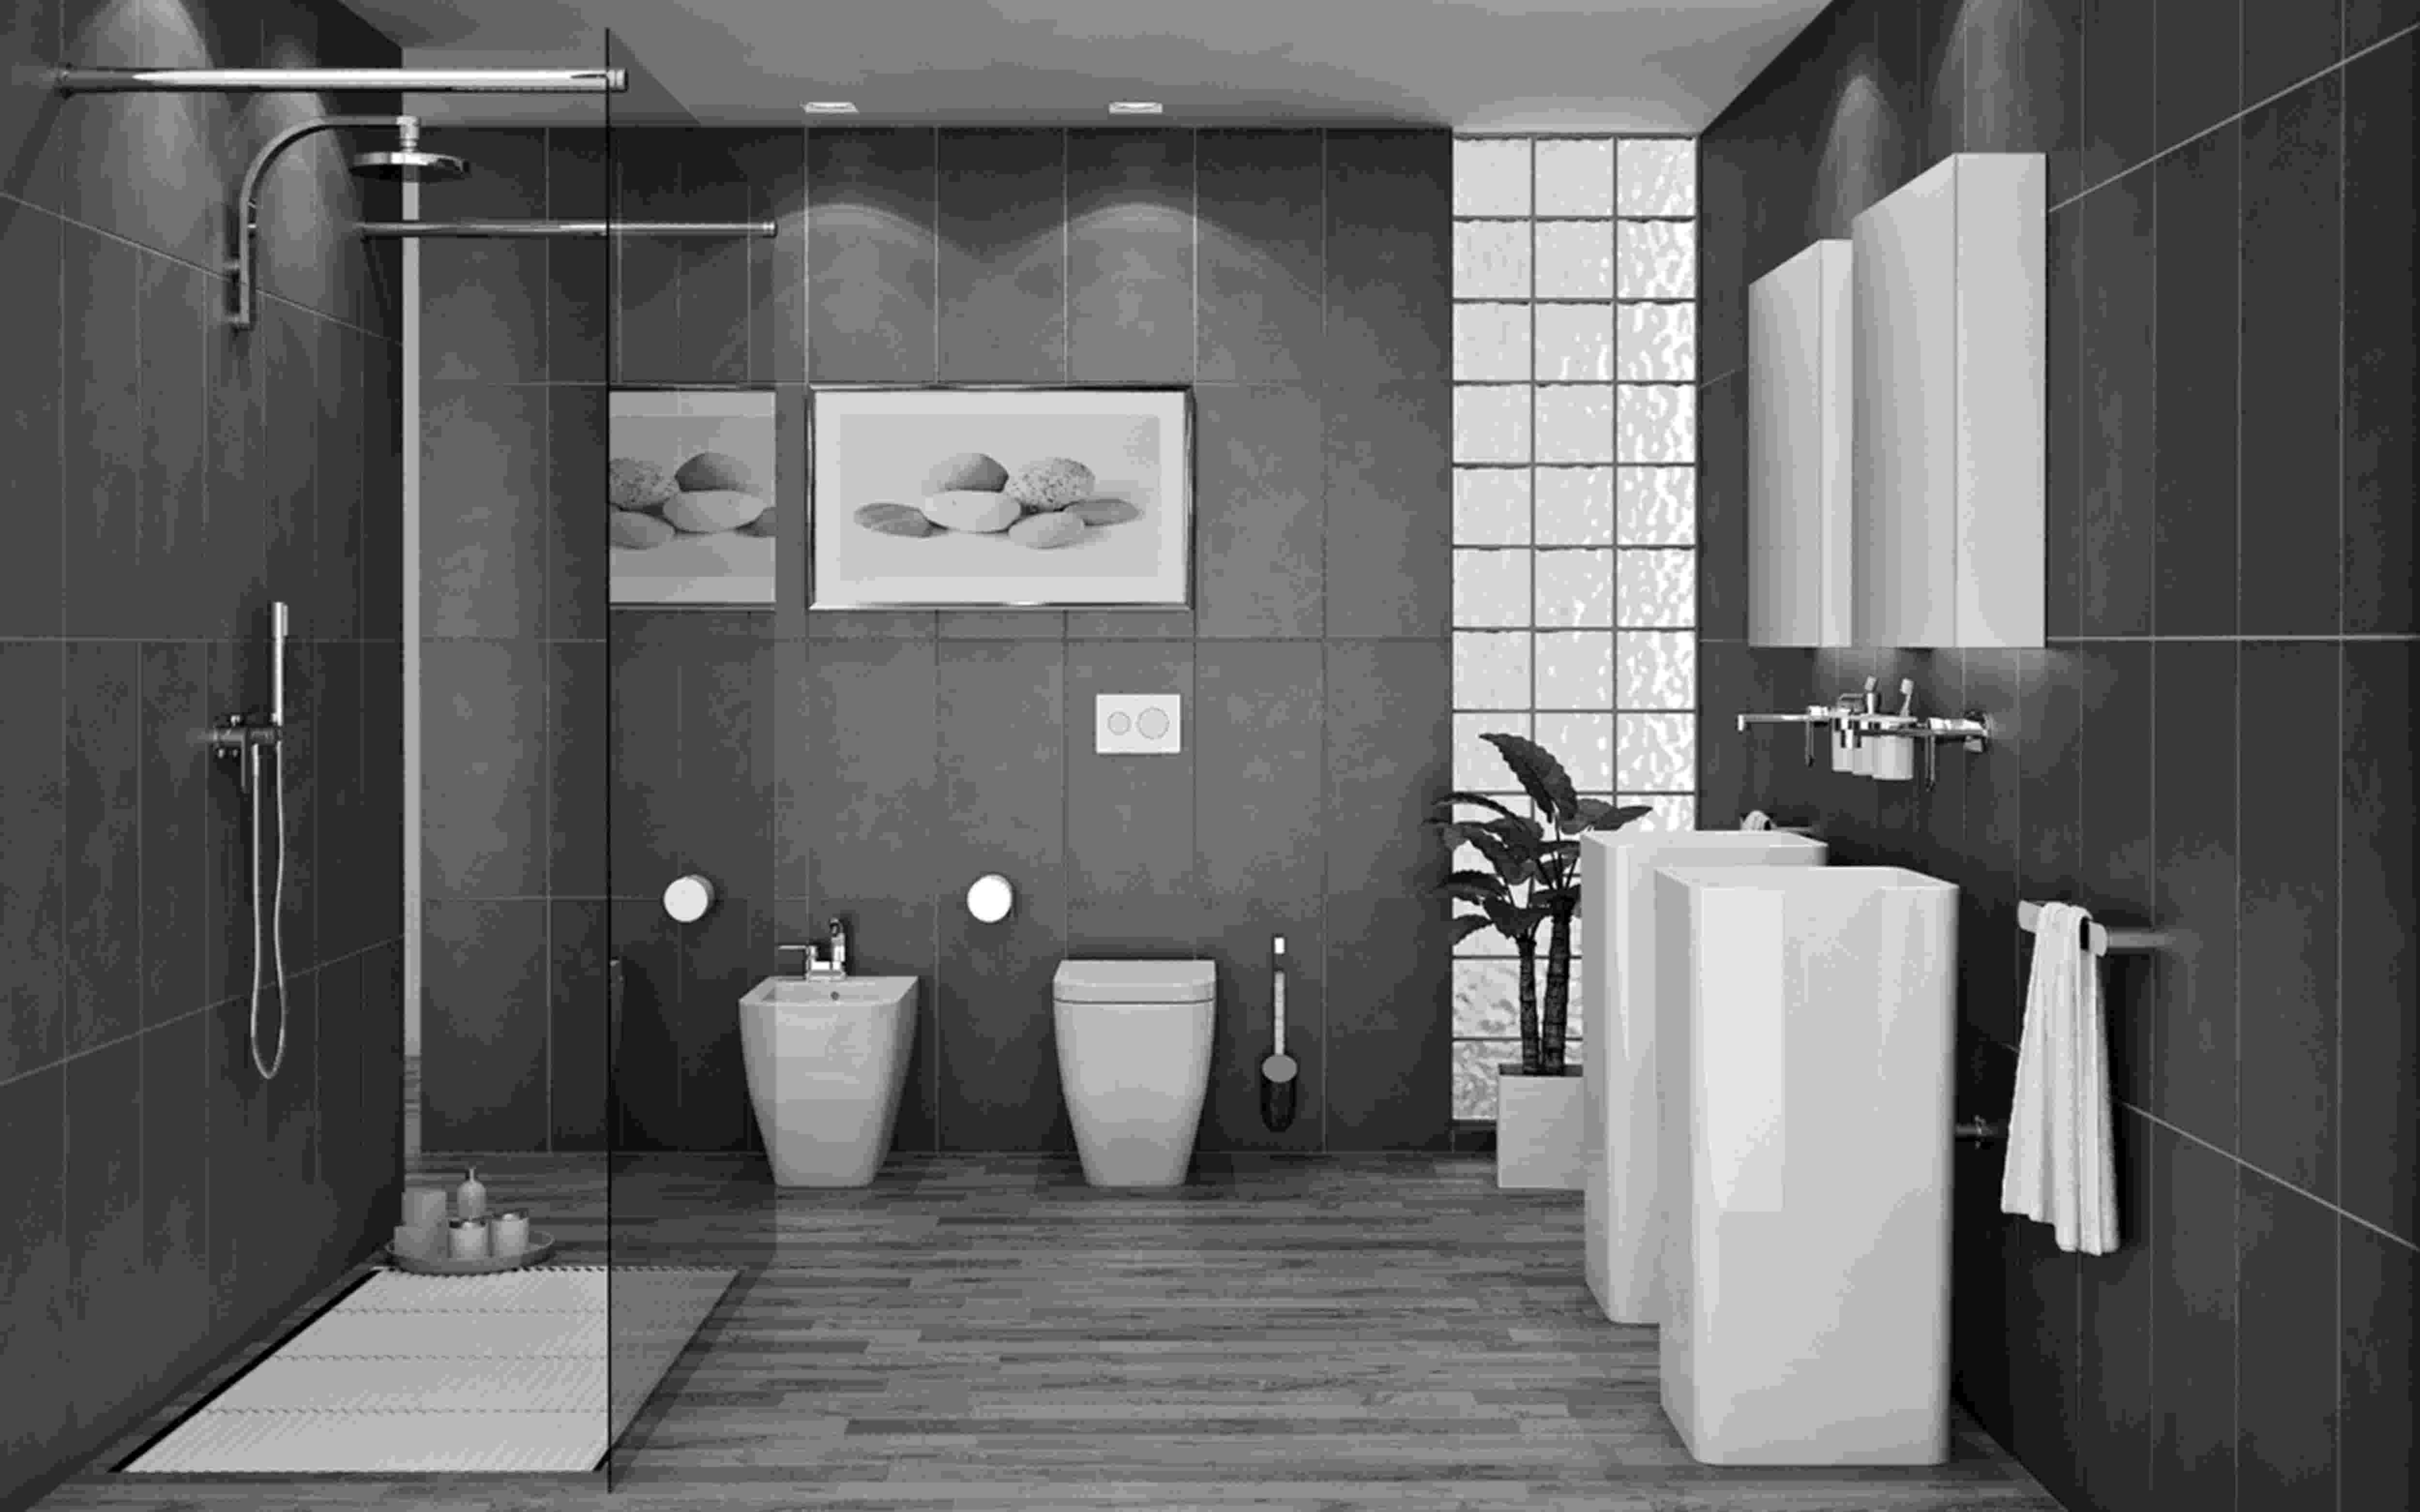 bathroom colours ideas designs 24 amazing ideas and pictures of old bathroom floor tile 2019 colours ideas bathroom designs